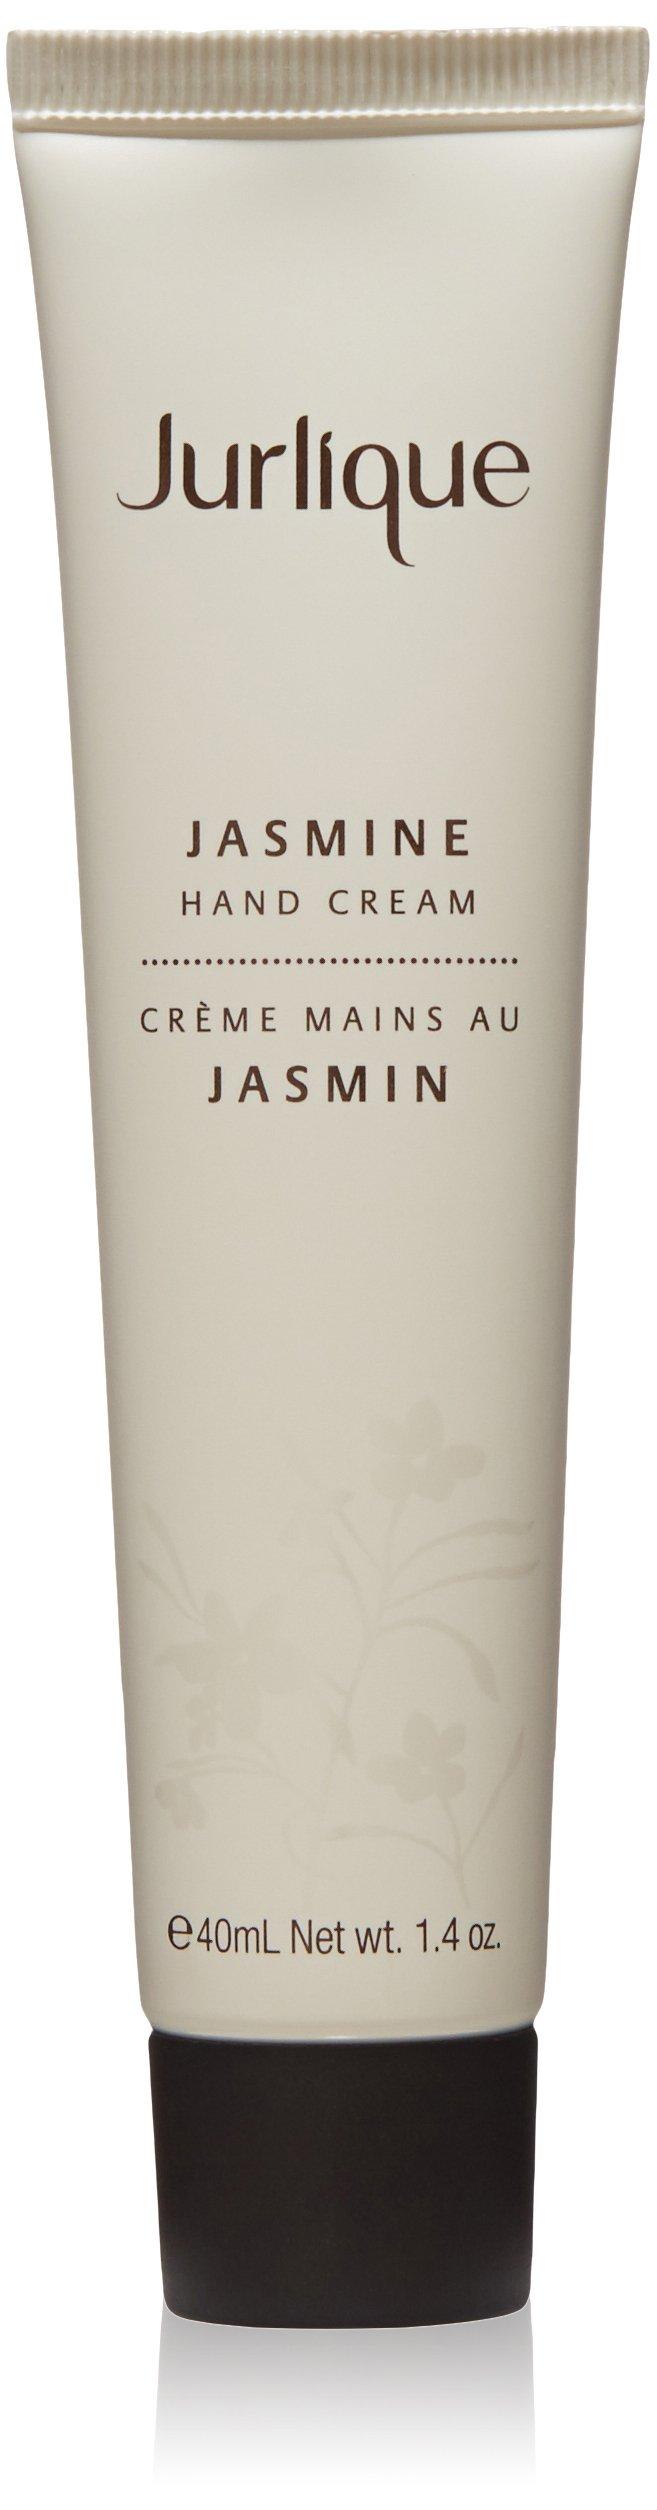 Jurlique Jasmine Hand Cream for Women, 1.4 oz